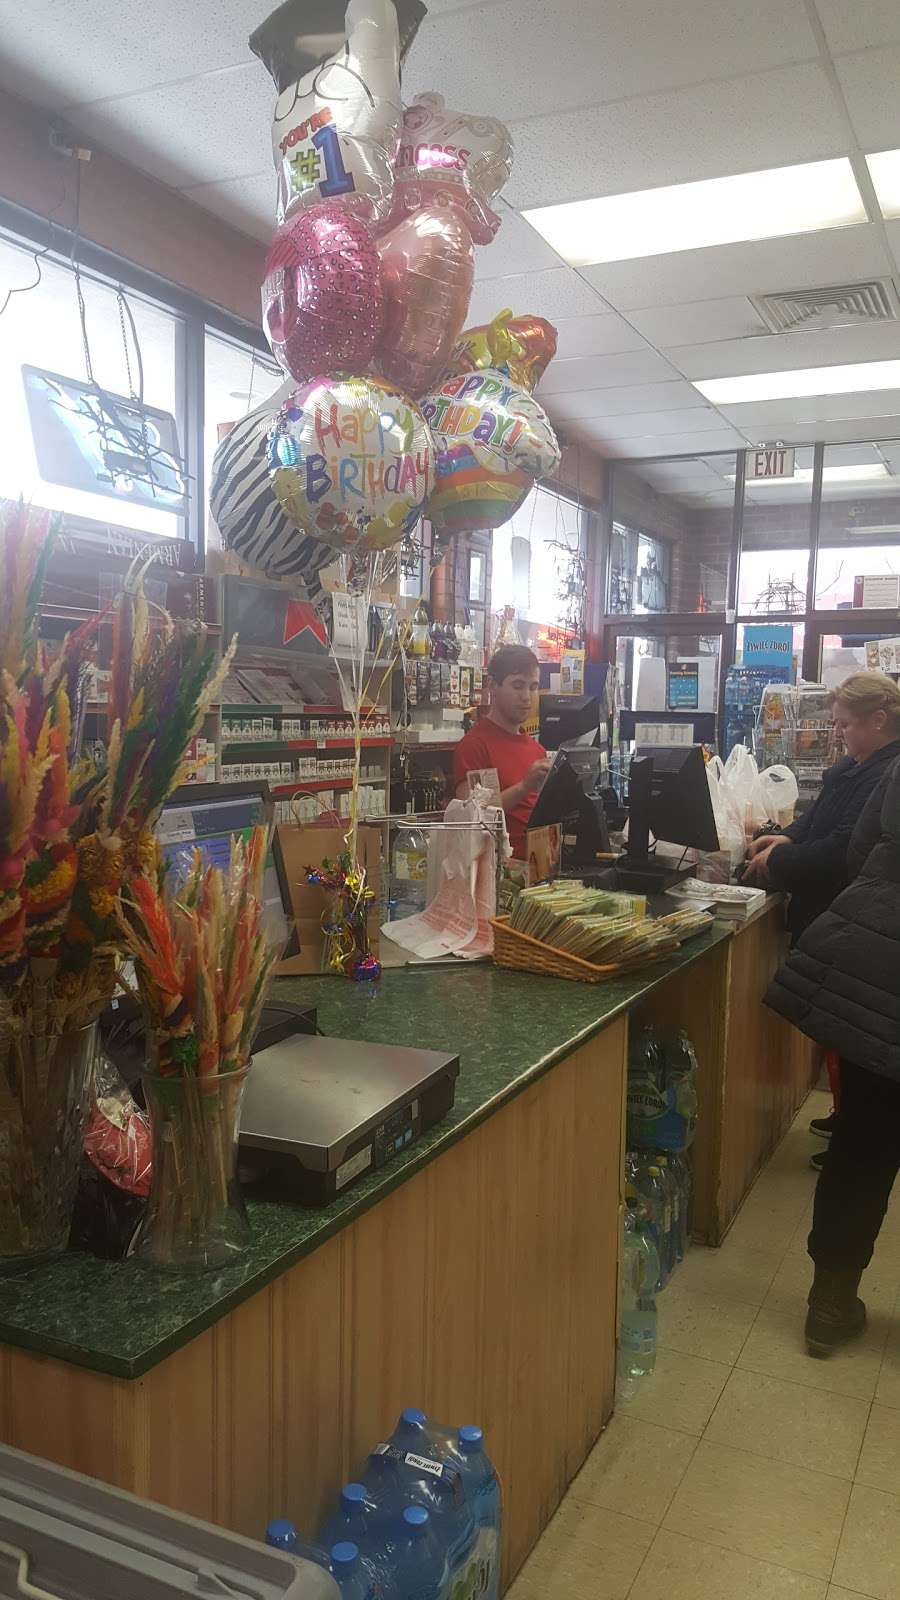 Palos Deli & Liquor - store  | Photo 5 of 10 | Address: 10650 S Roberts Rd, Palos Hills, IL 60465, USA | Phone: (708) 974-3245